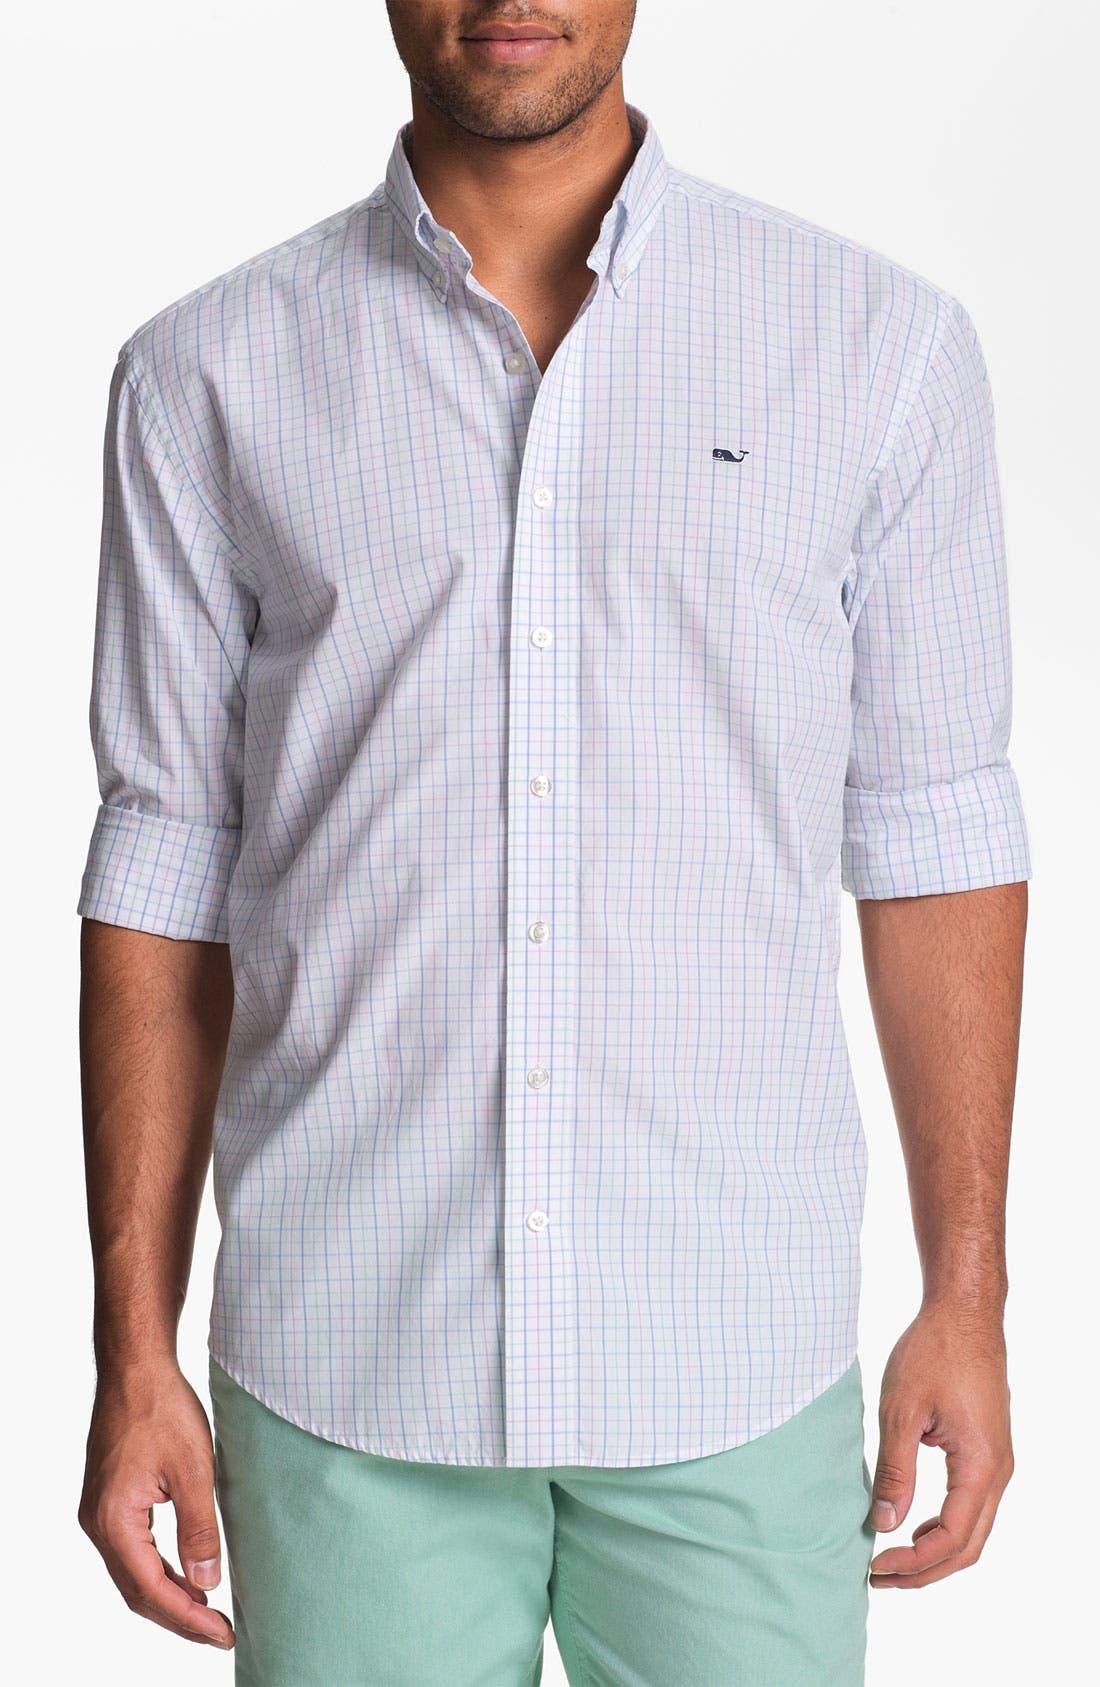 Alternate Image 1 Selected - Vineyard Vines 'Cades Bay' Regular Fit Sport Shirt